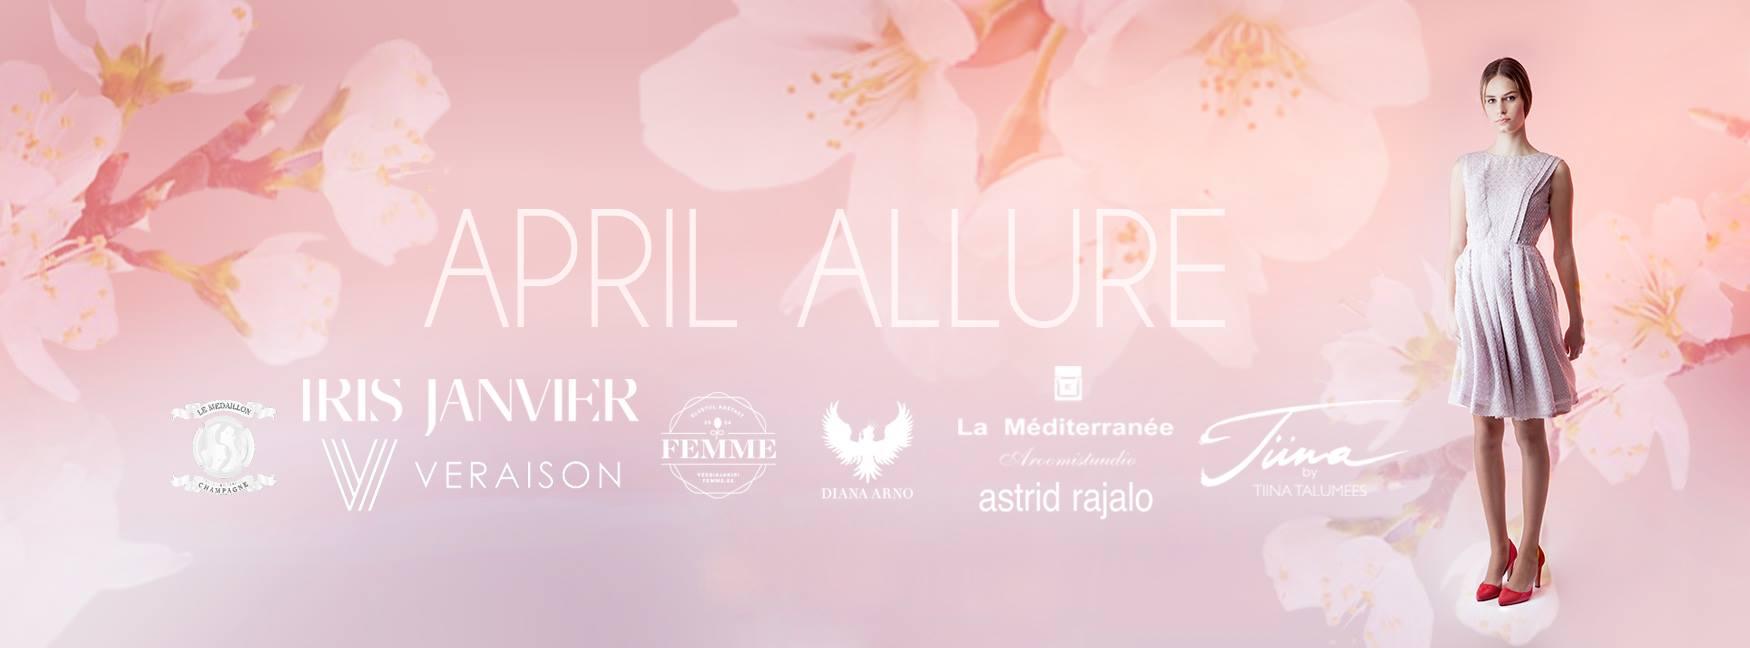 april allure